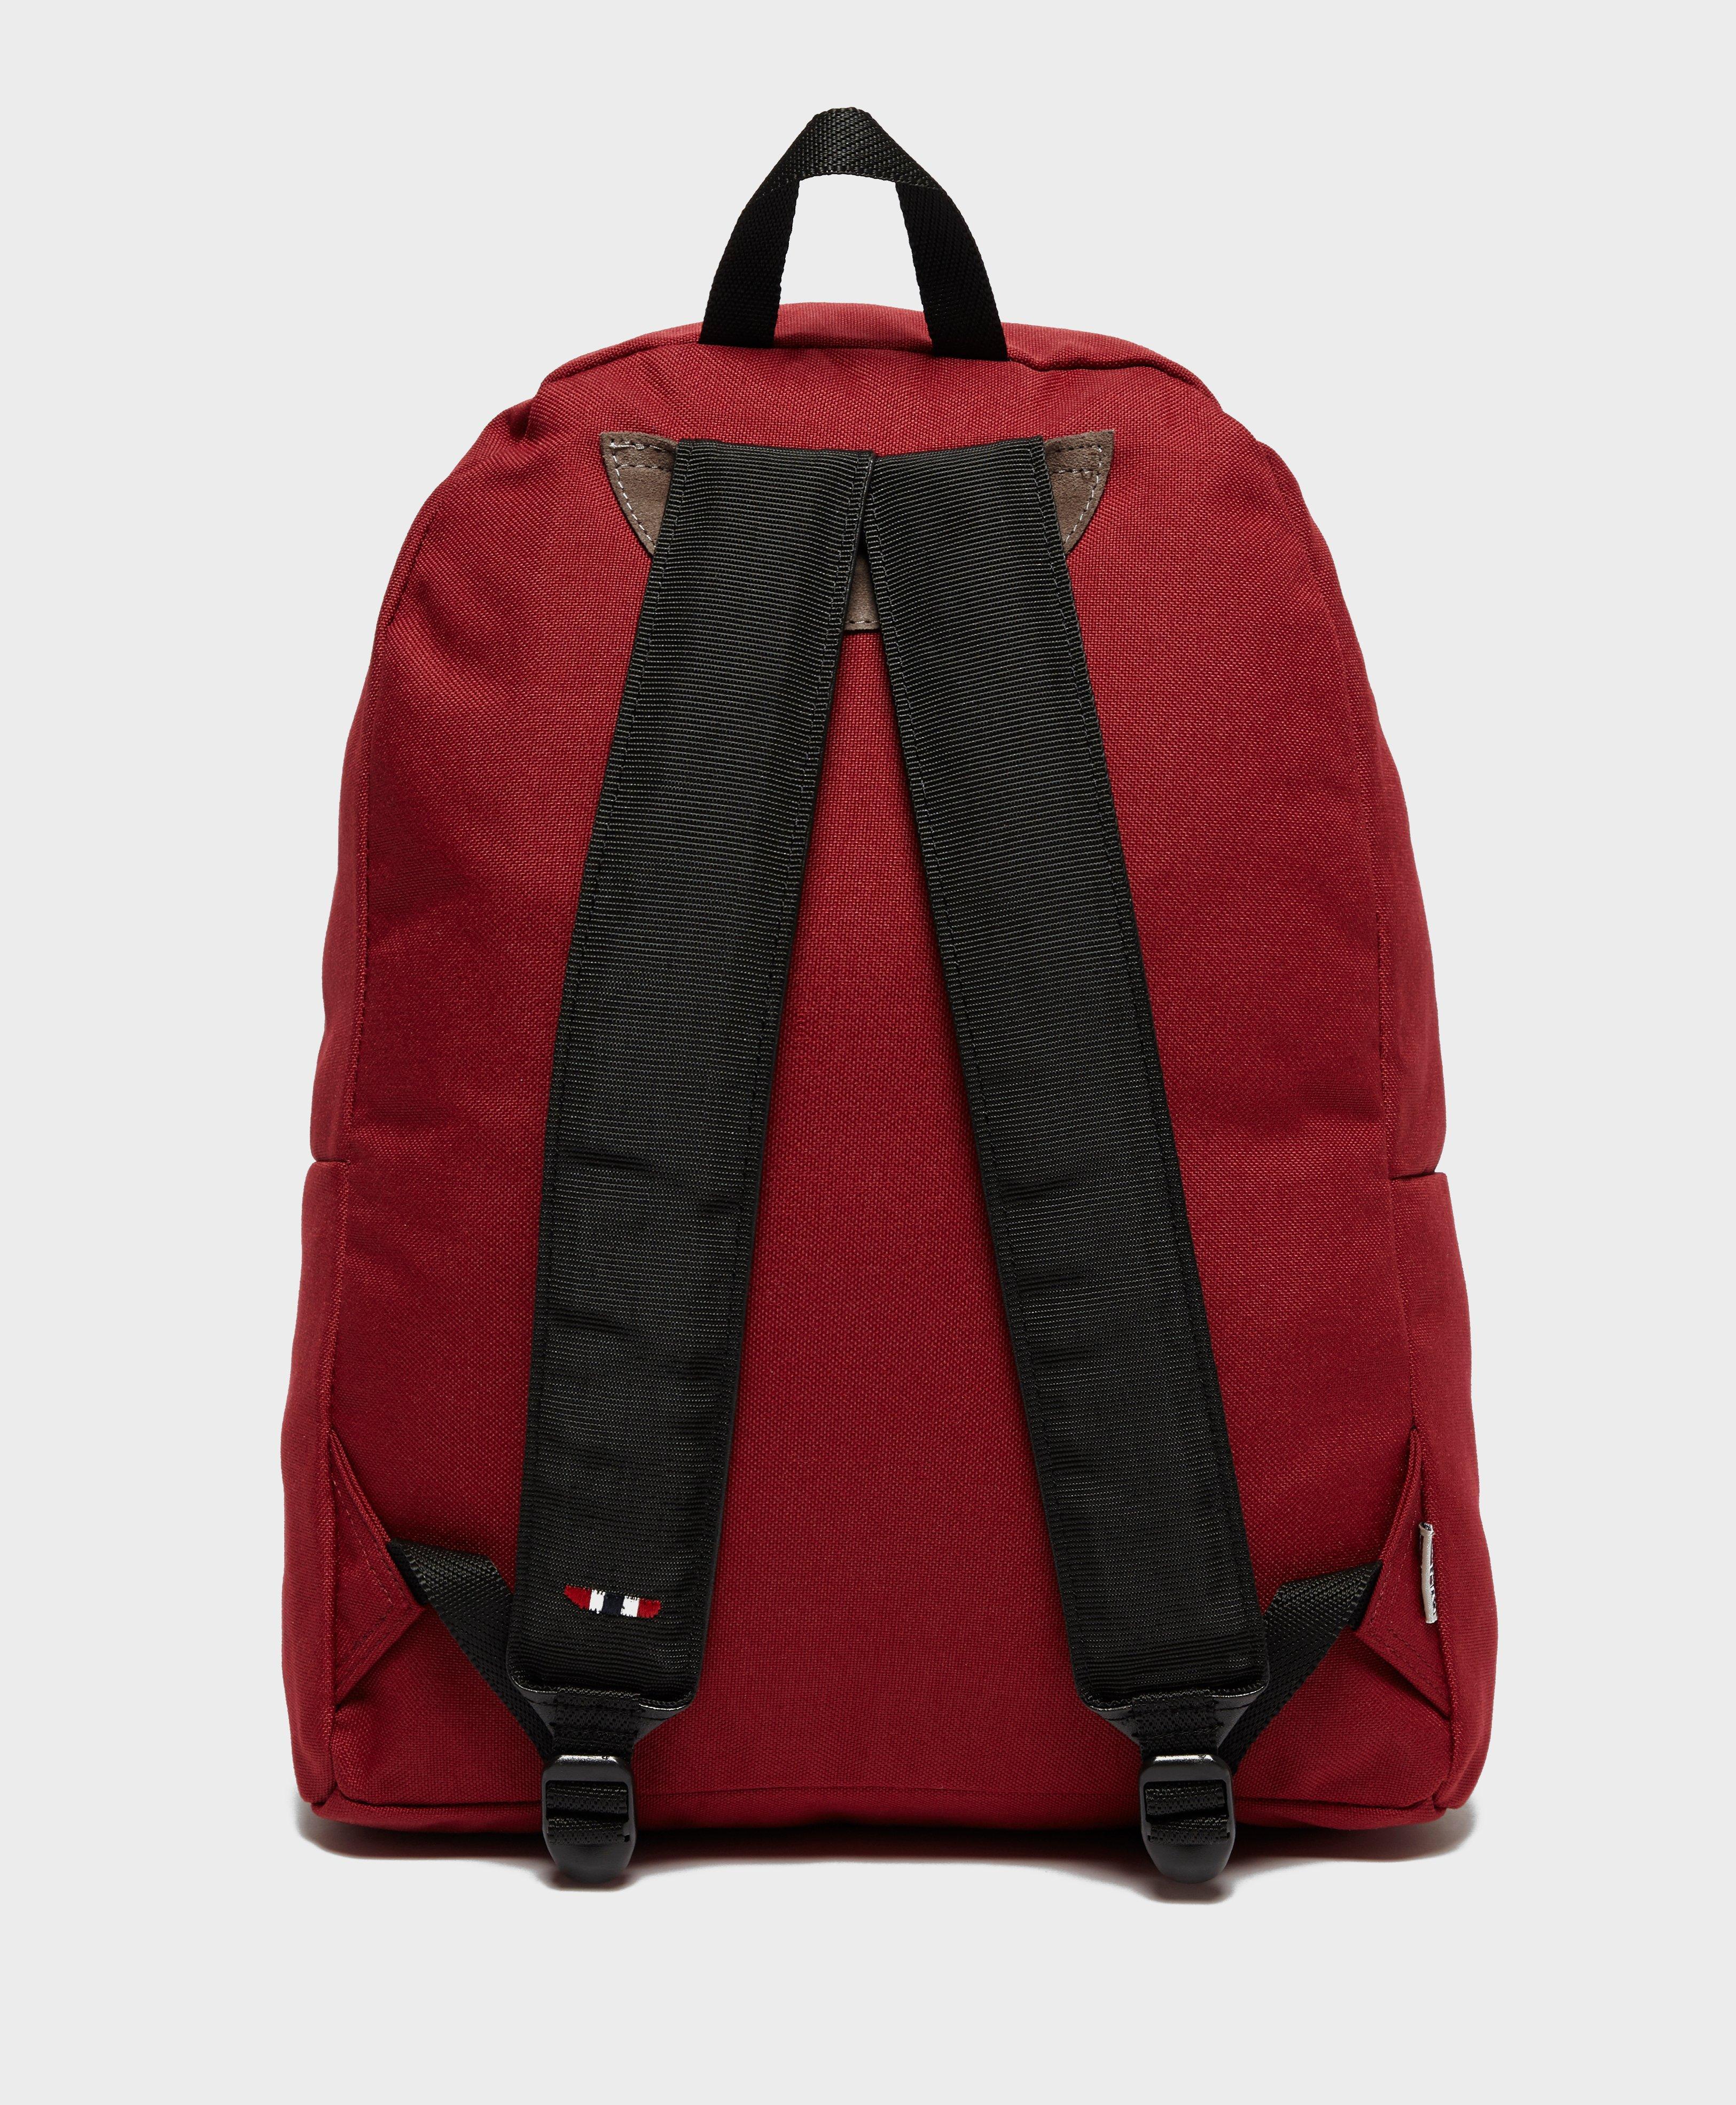 Napapijri Voyage Backpack in Red for Men - Lyst 41ceaa44b9e7